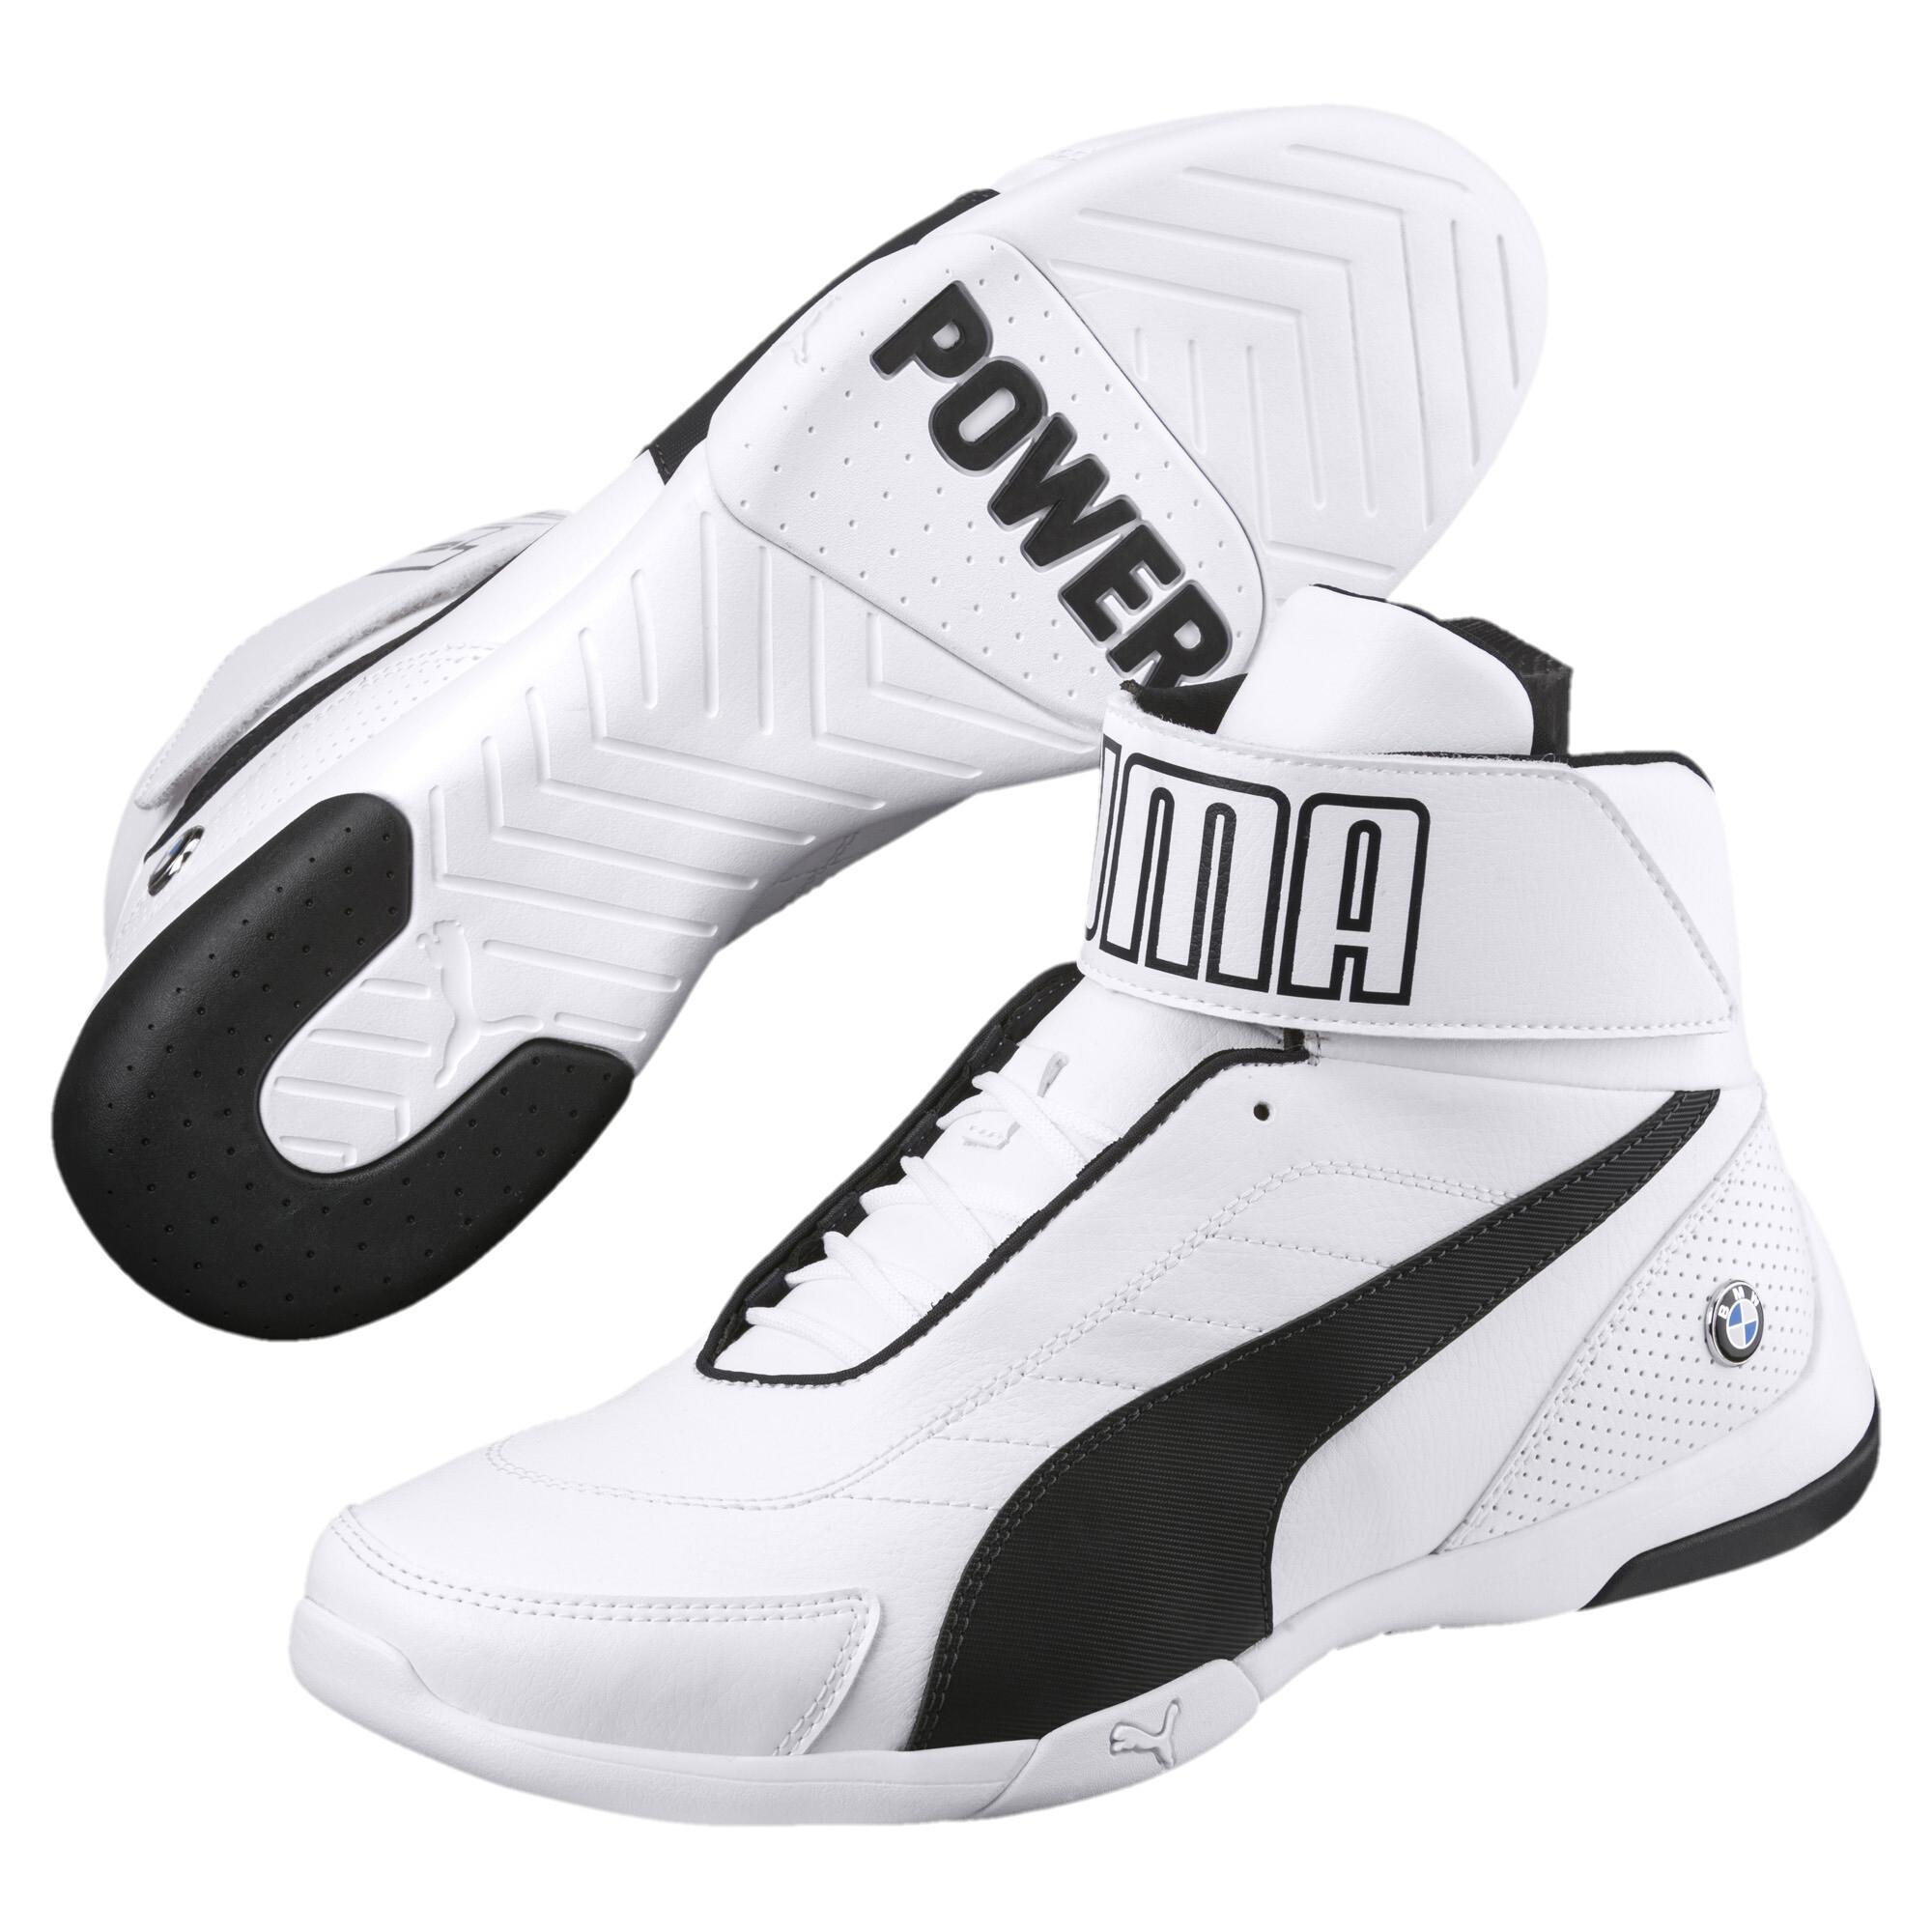 23dee27d89 Details about PUMA BMW M Motorsport Kart Cat III Mid Men's Shoes Men Mid  Boot Auto